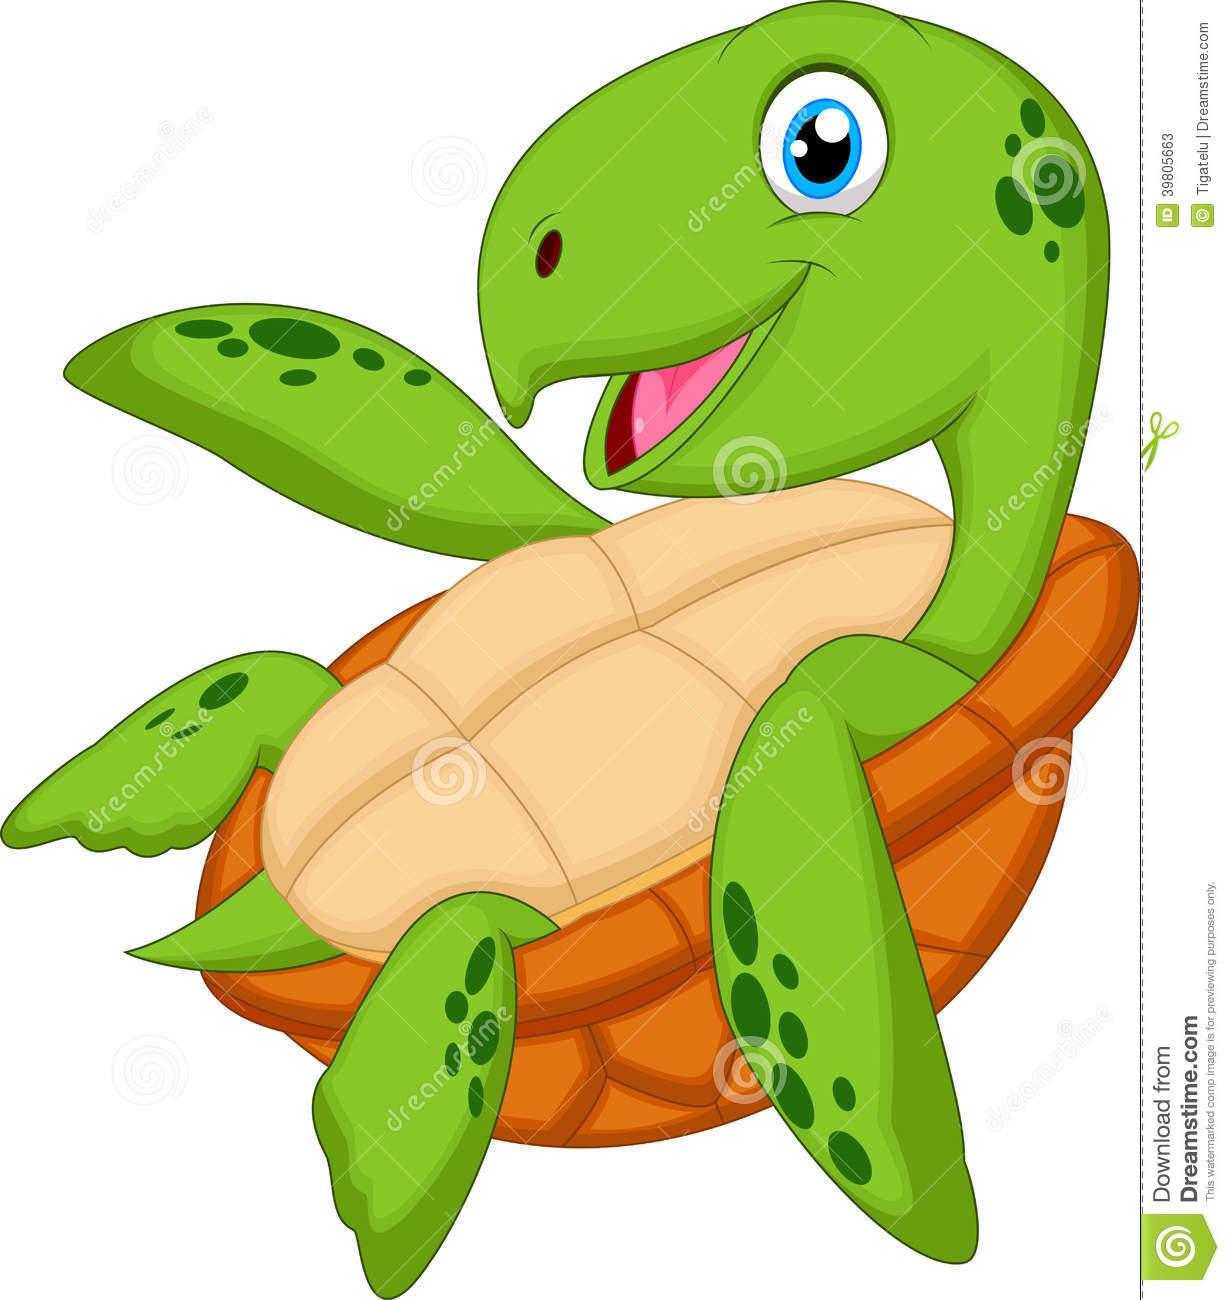 Sea Turtle clipart adorable cartoon #2